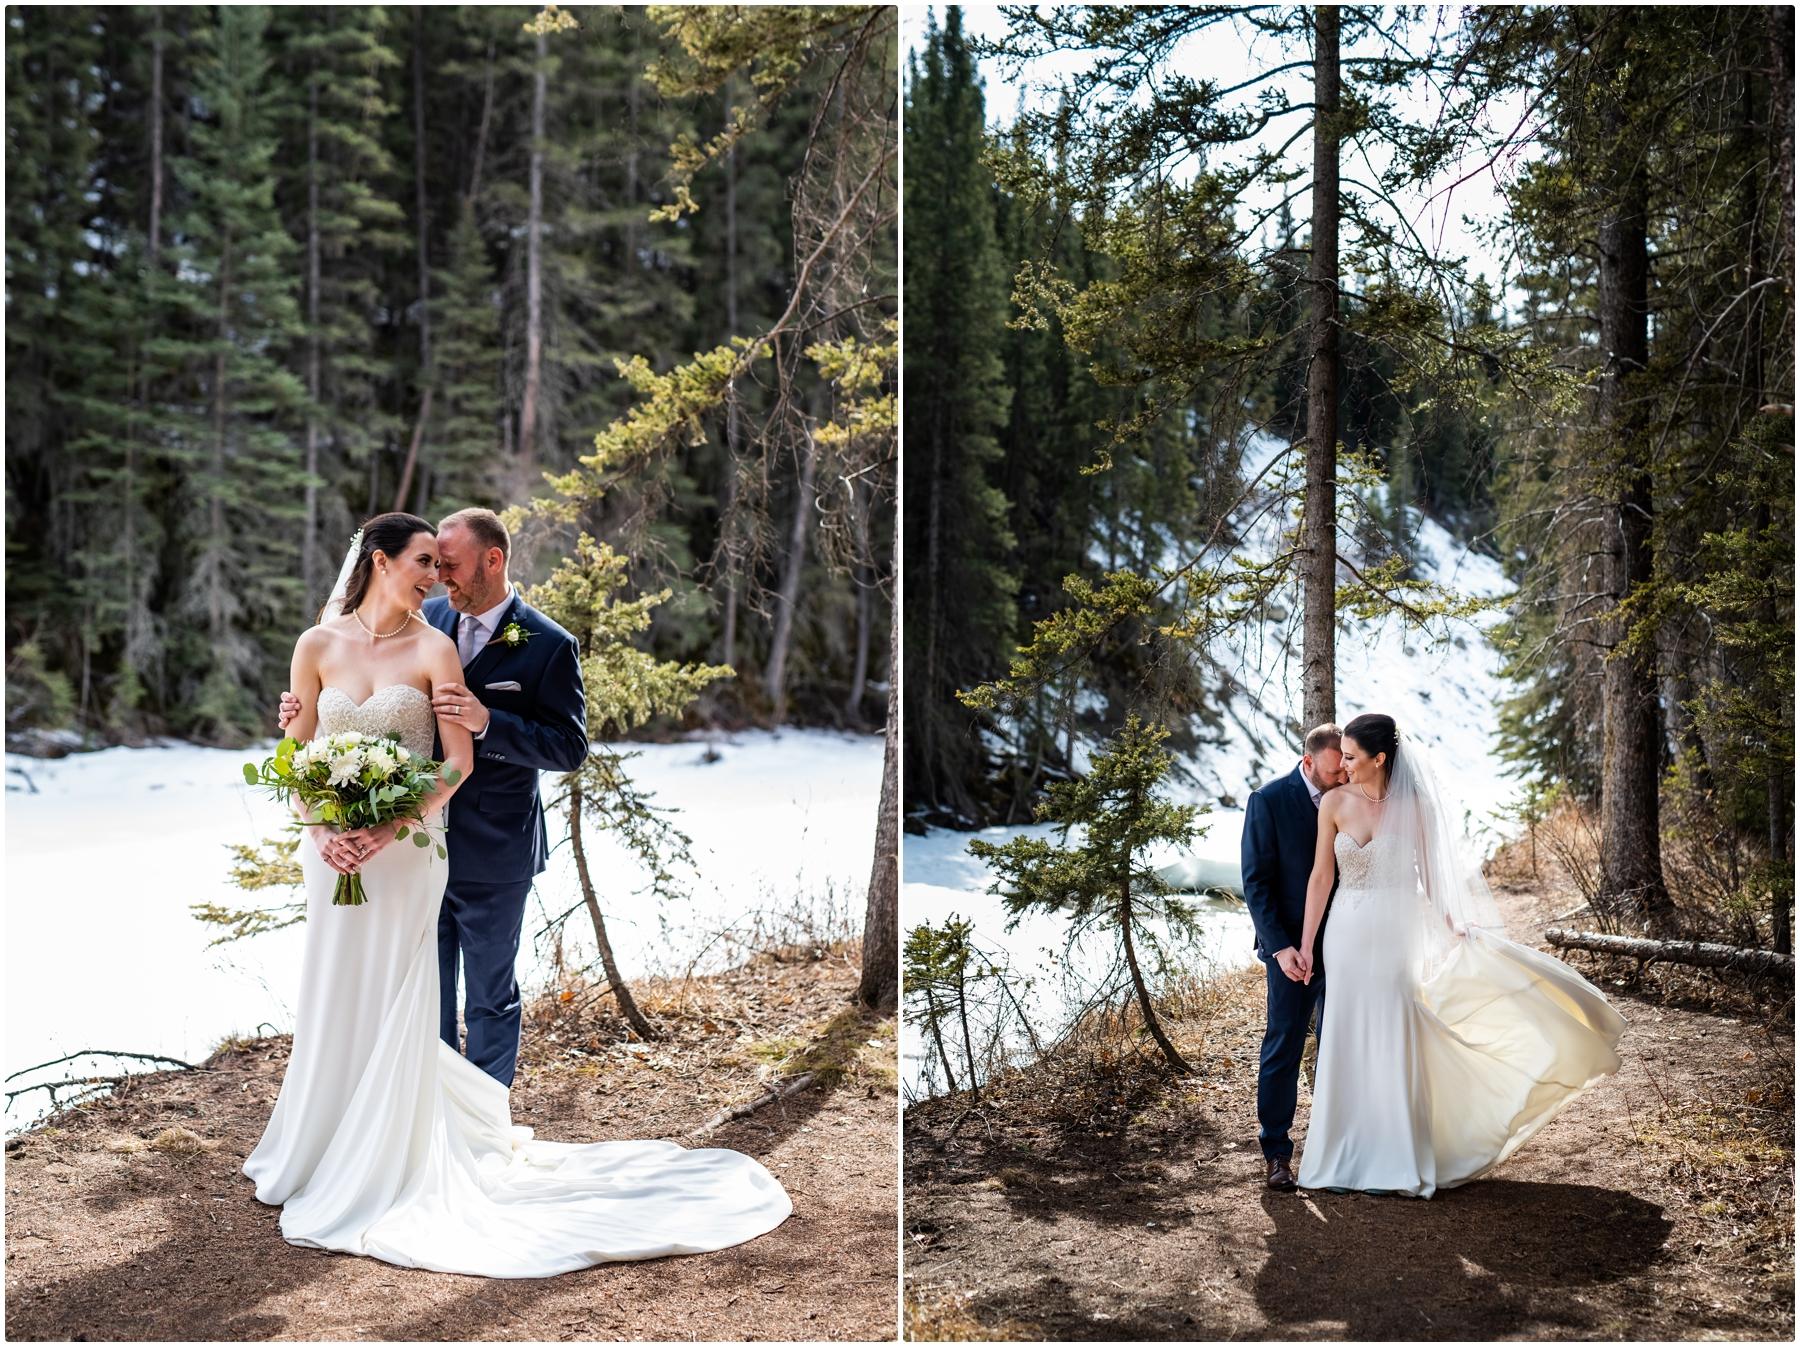 Bride & Groom Formal Wedding Photography Calgary